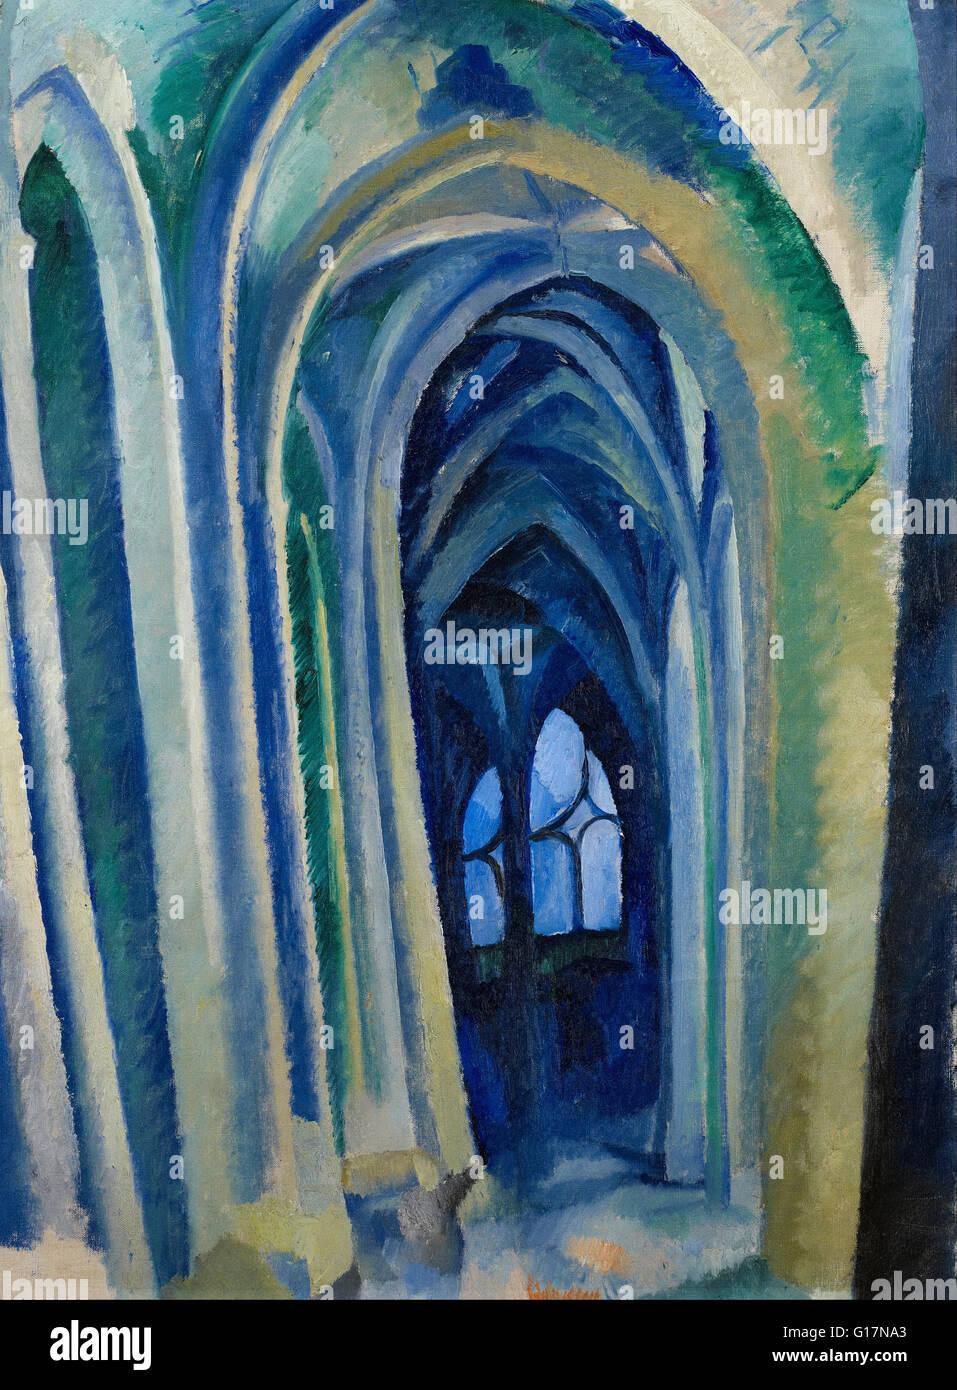 Robert Delaunay - Saint-Séverin - Minneapolis Institute of Art - Stock Image